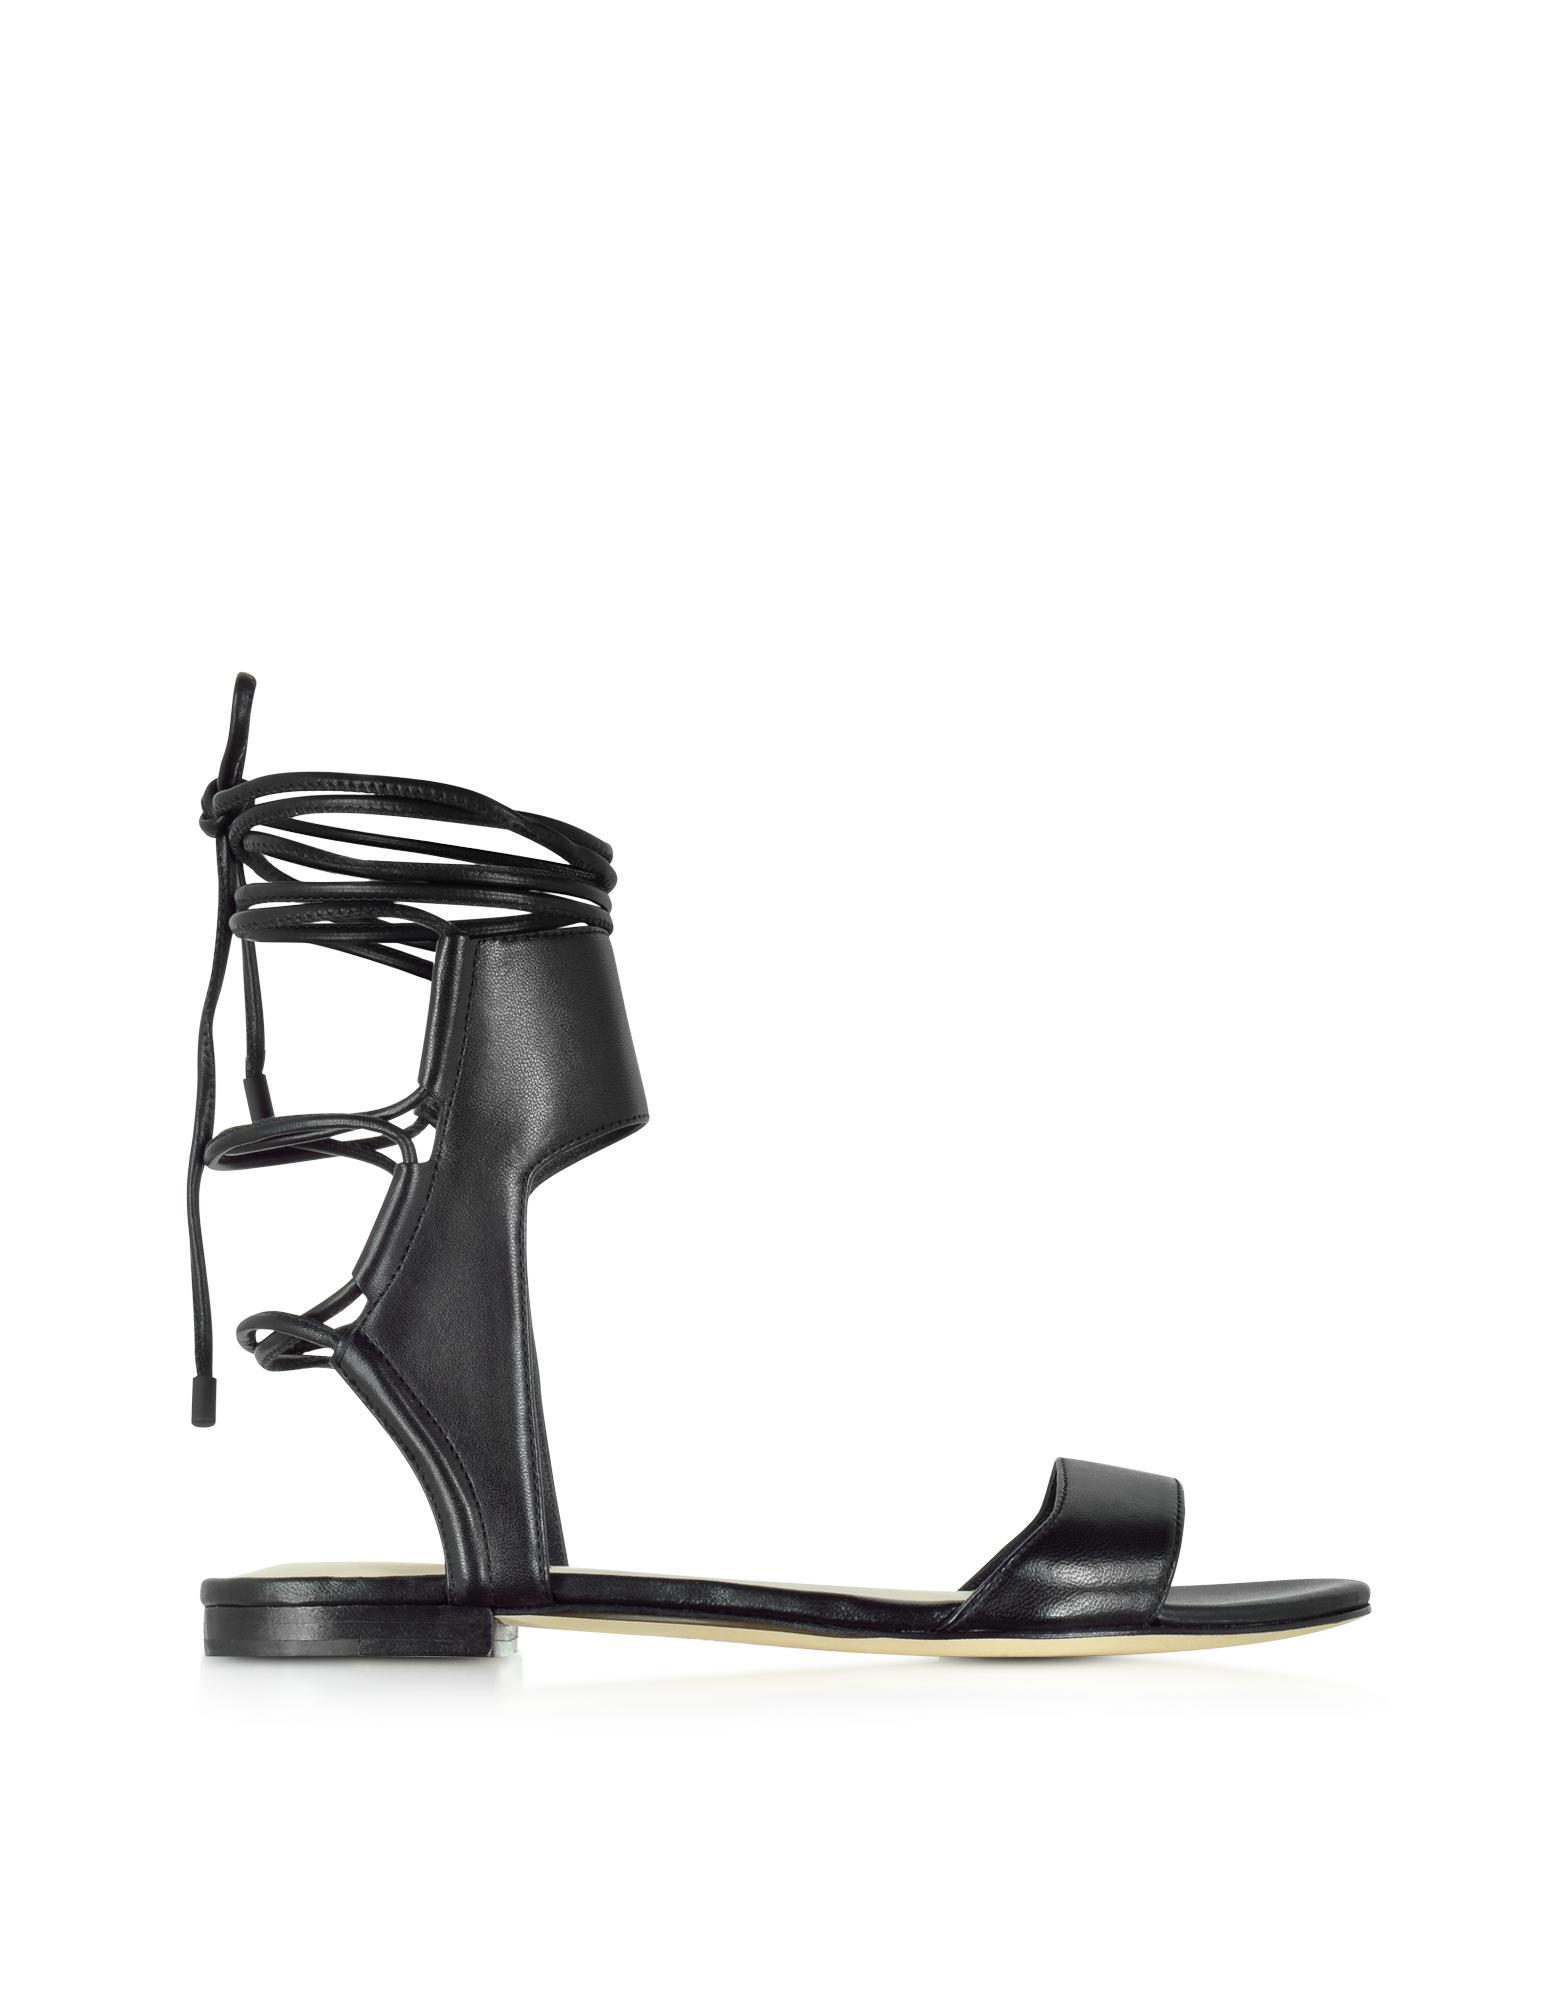 Martini Black Leather Ankle Lace Flat Sandal - 3.1 Phillip Lim